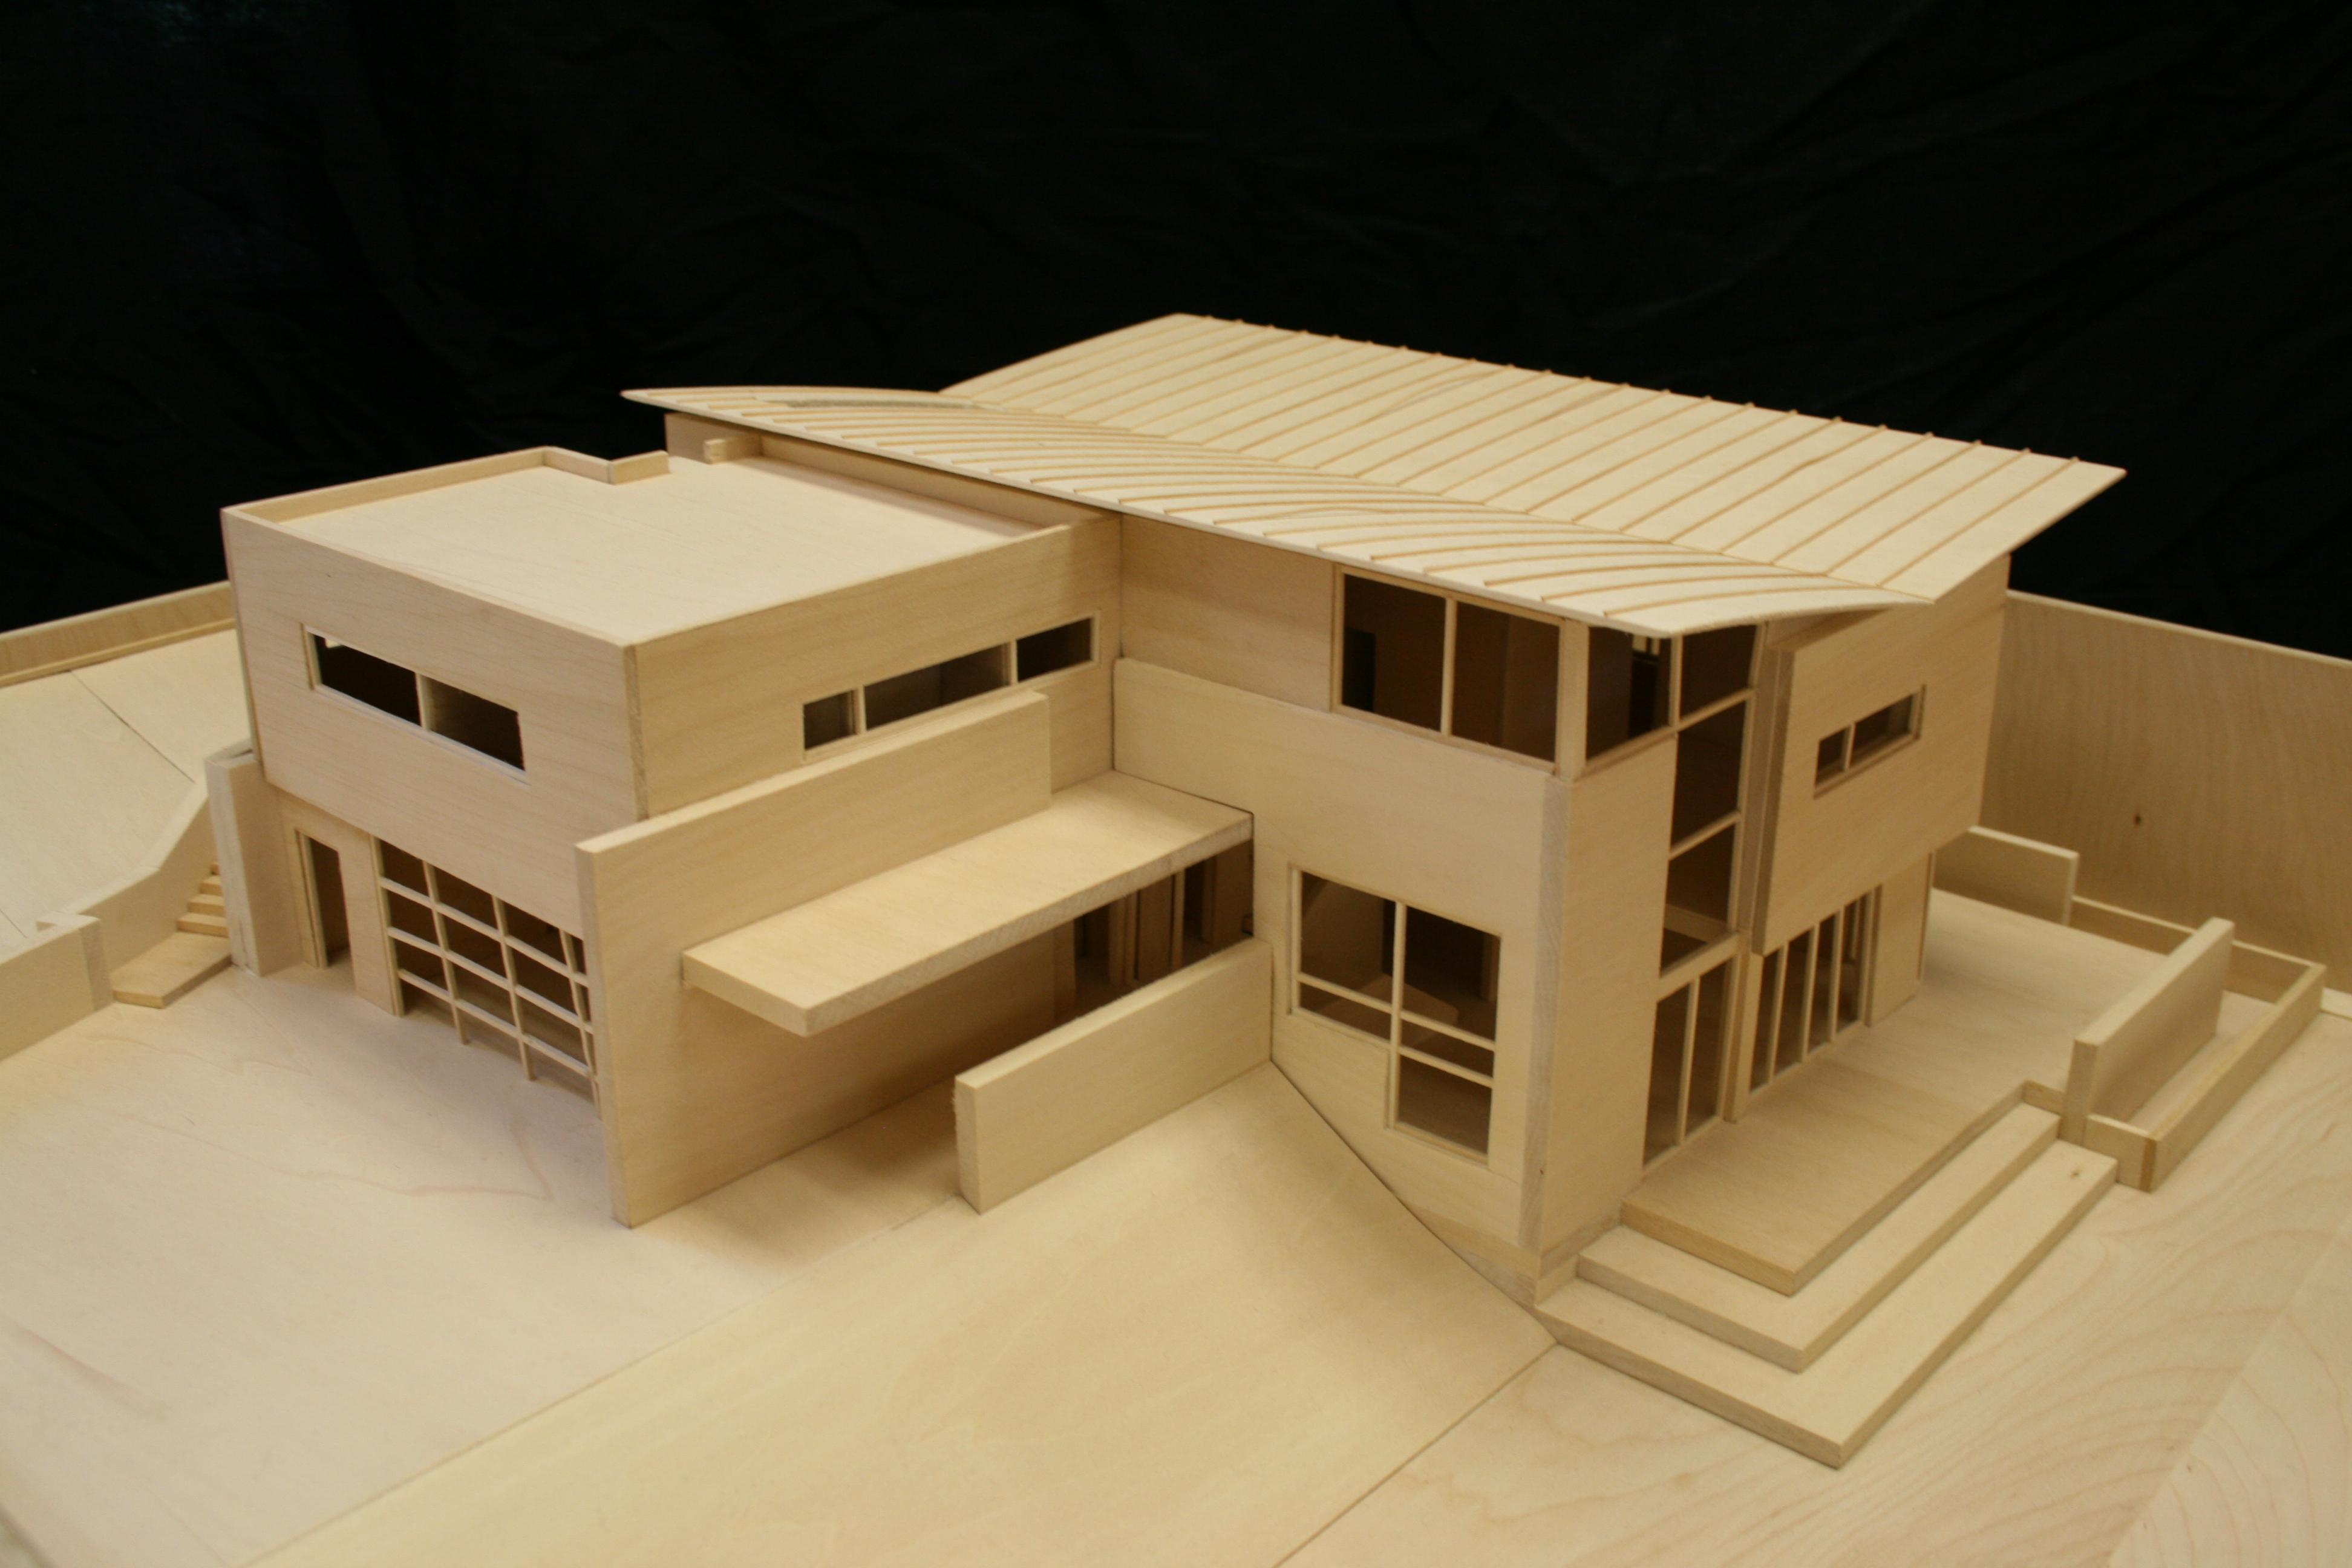 designblendz-3d-architectural-hand-built-models-the-y-residence ...